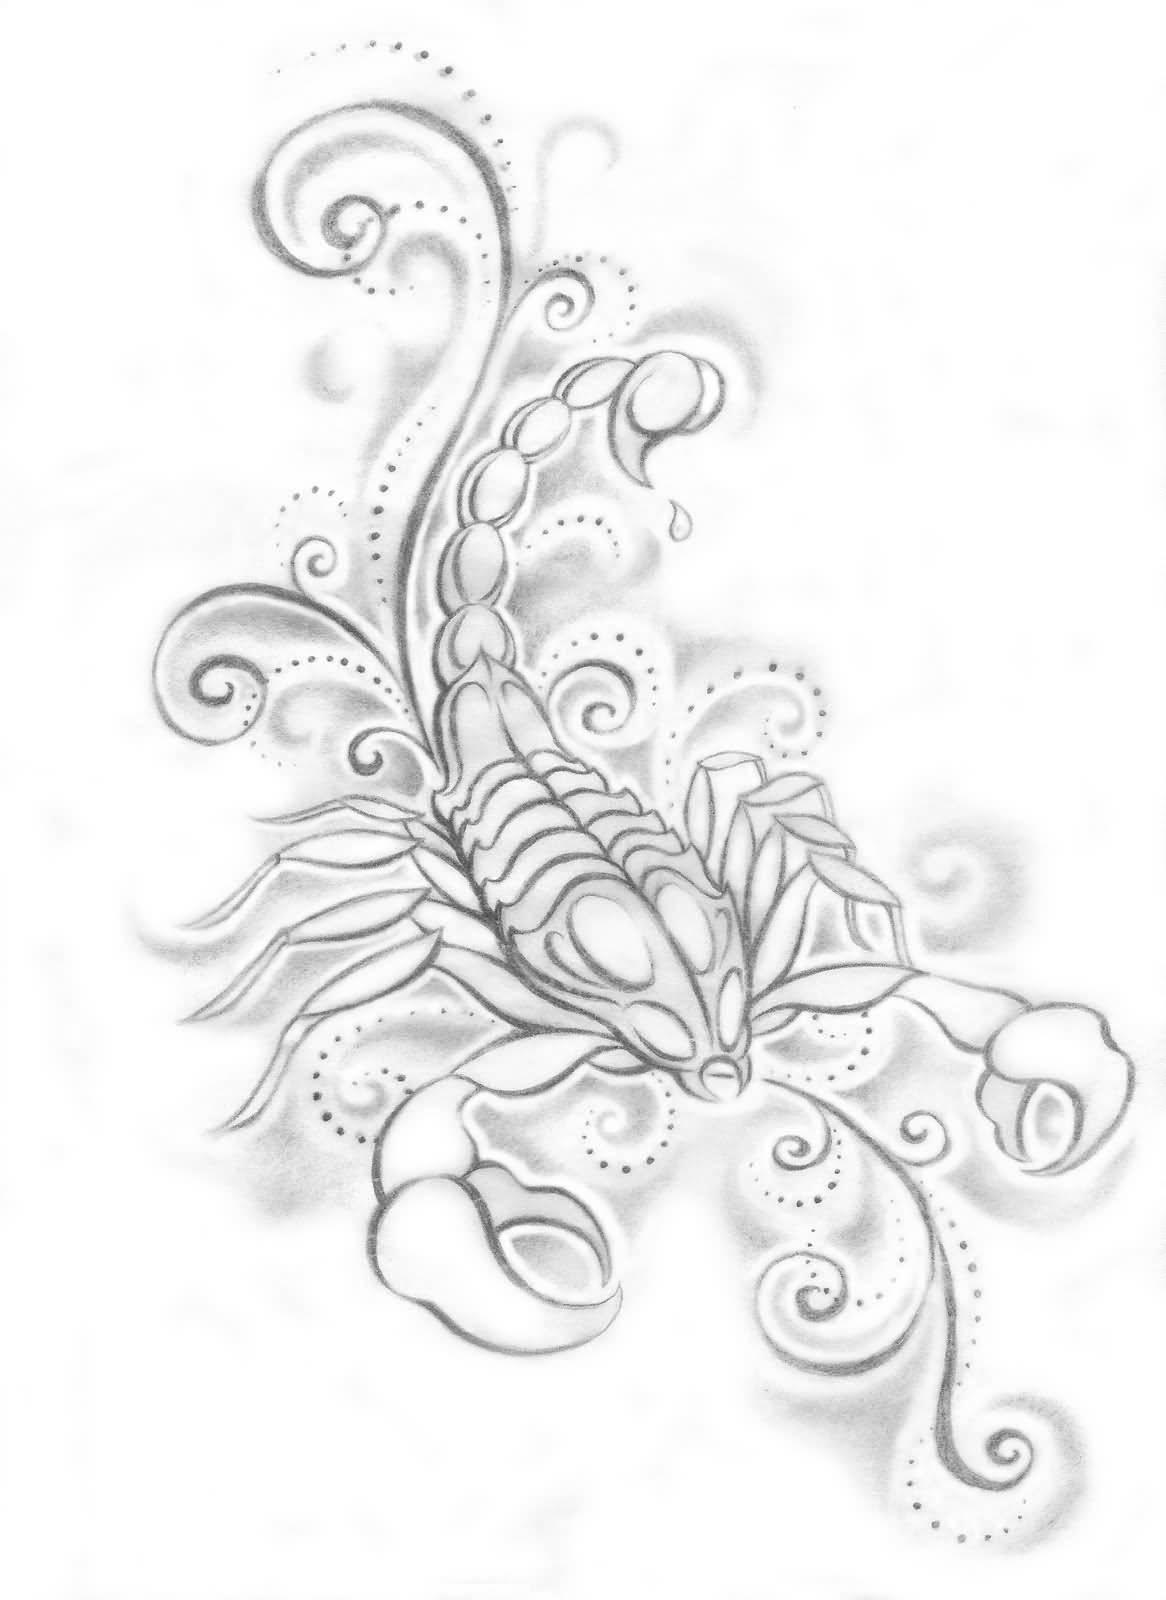 74ea2c1ecbd02 38+ Beautiful Girly Scorpion Tattoos Ideas